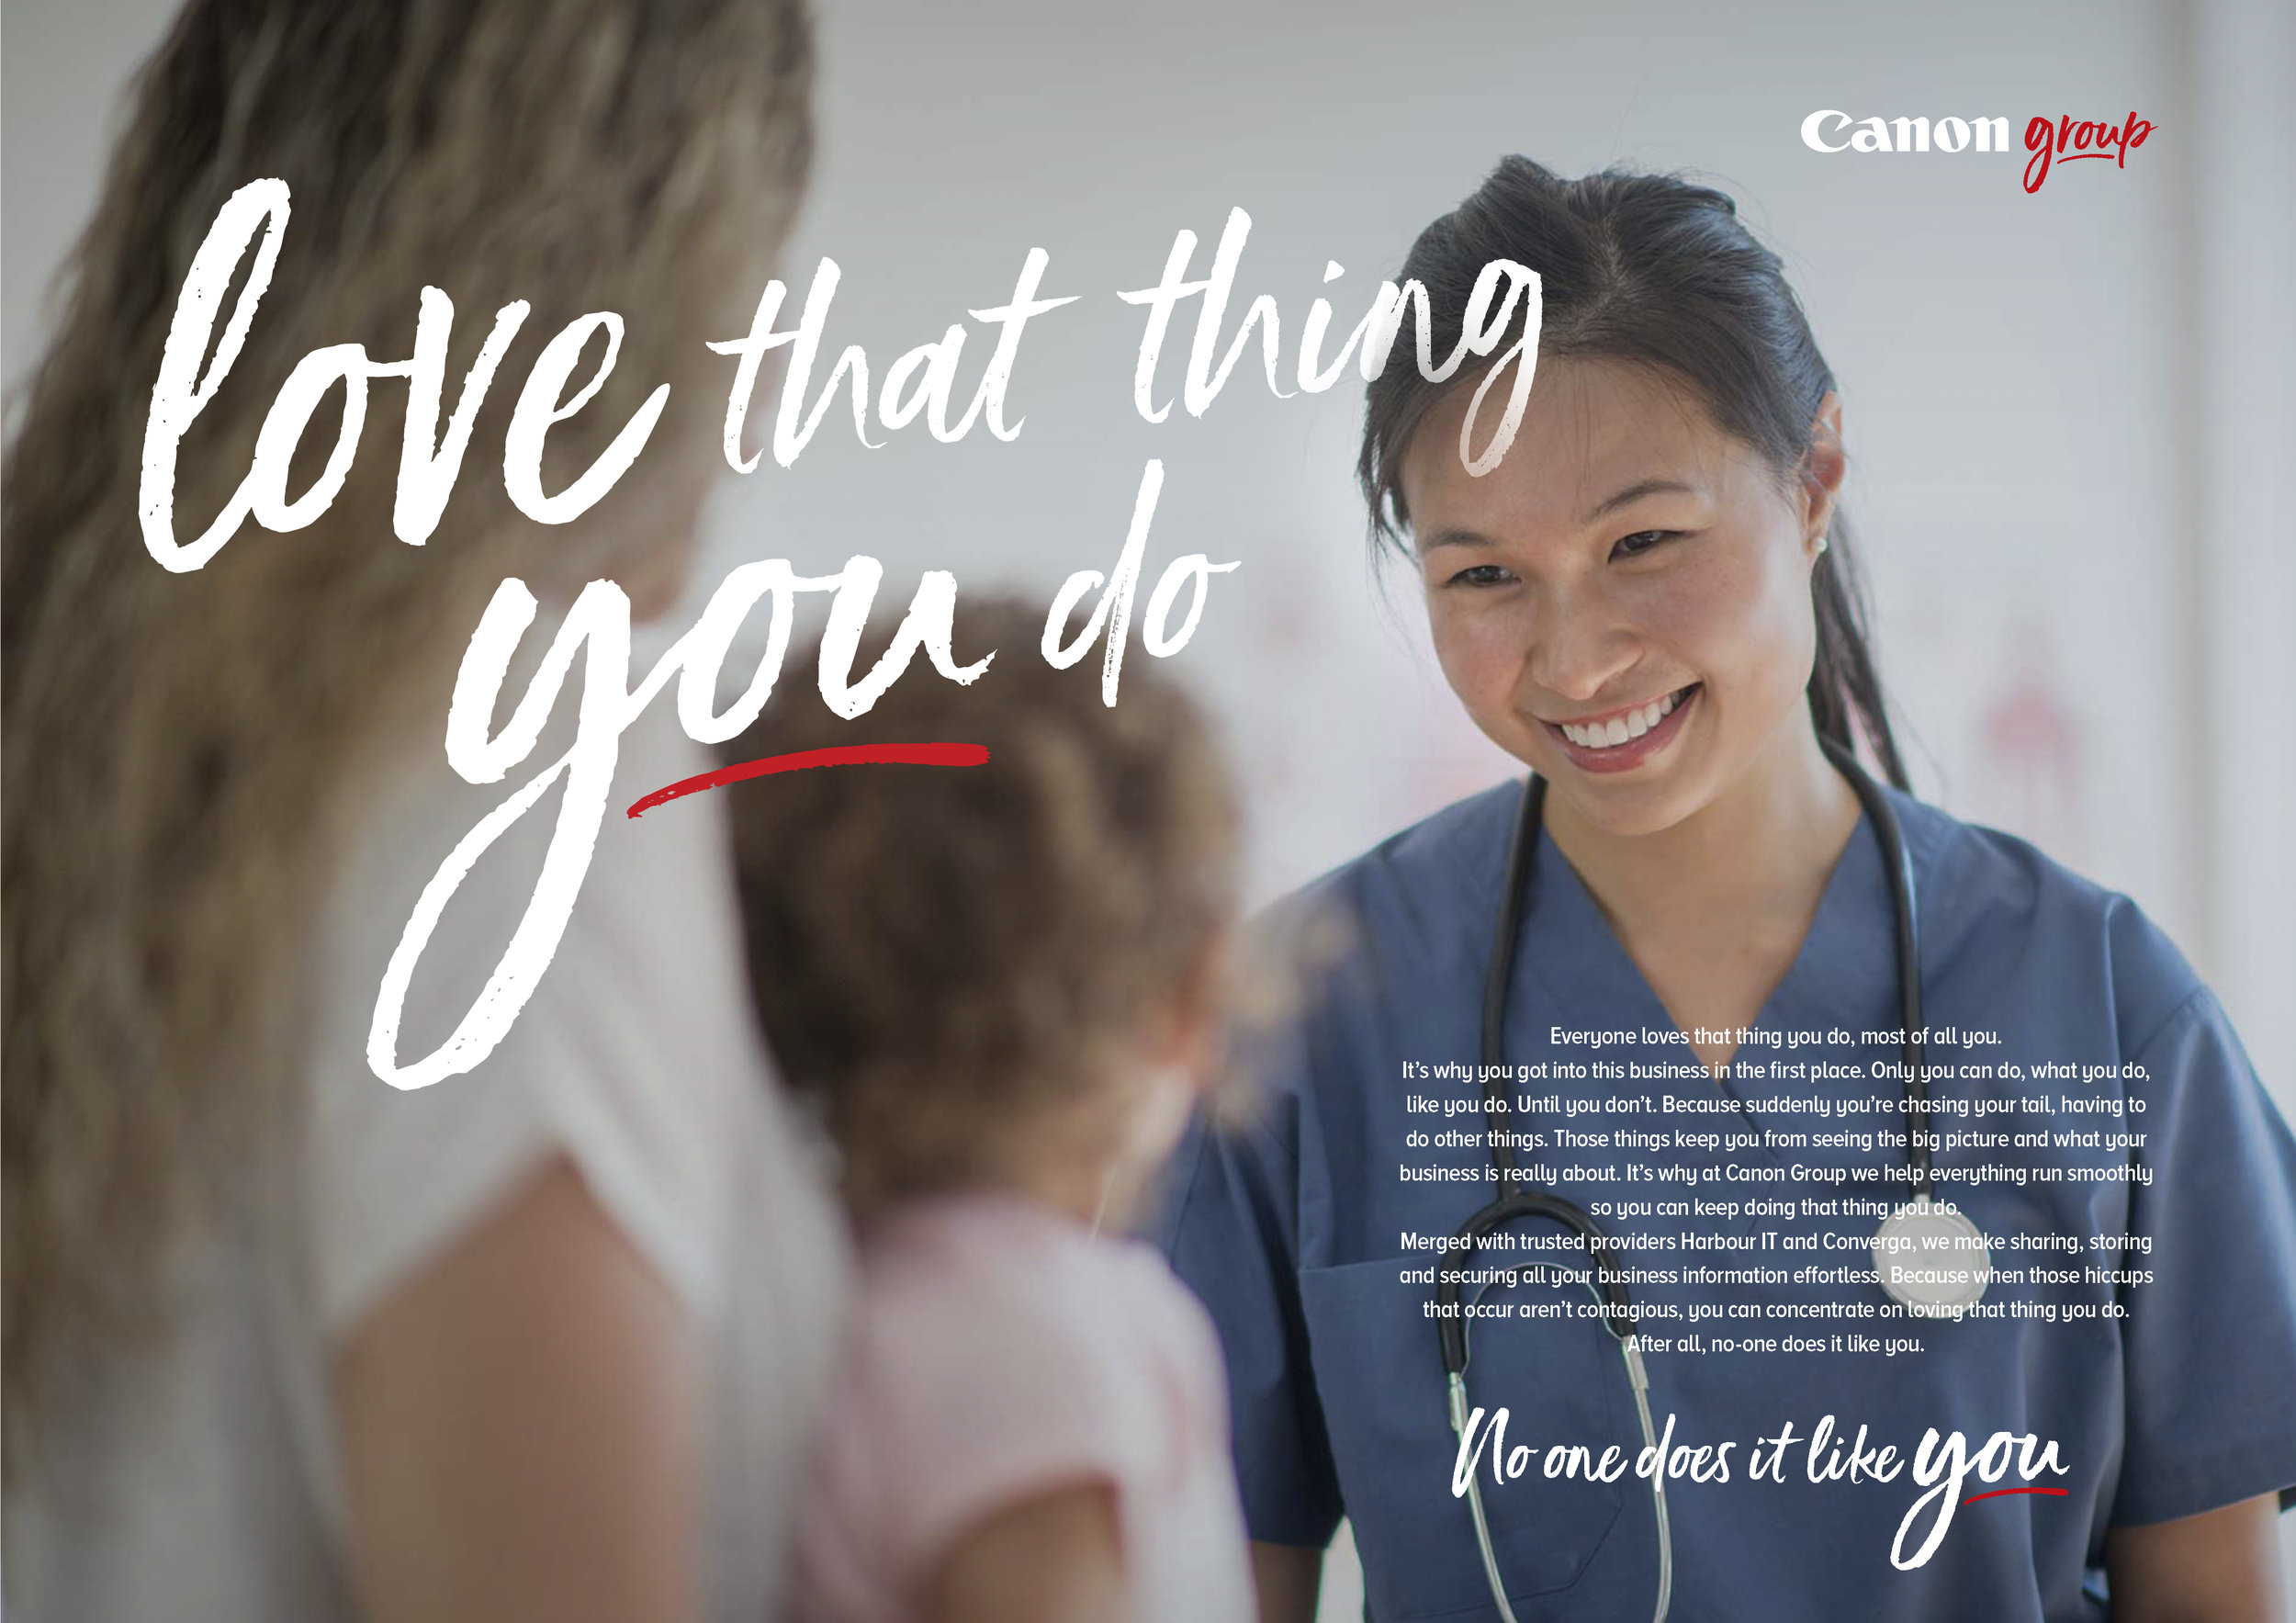 3503 Canon_CBS_Concepts S01 V01-11.jpg